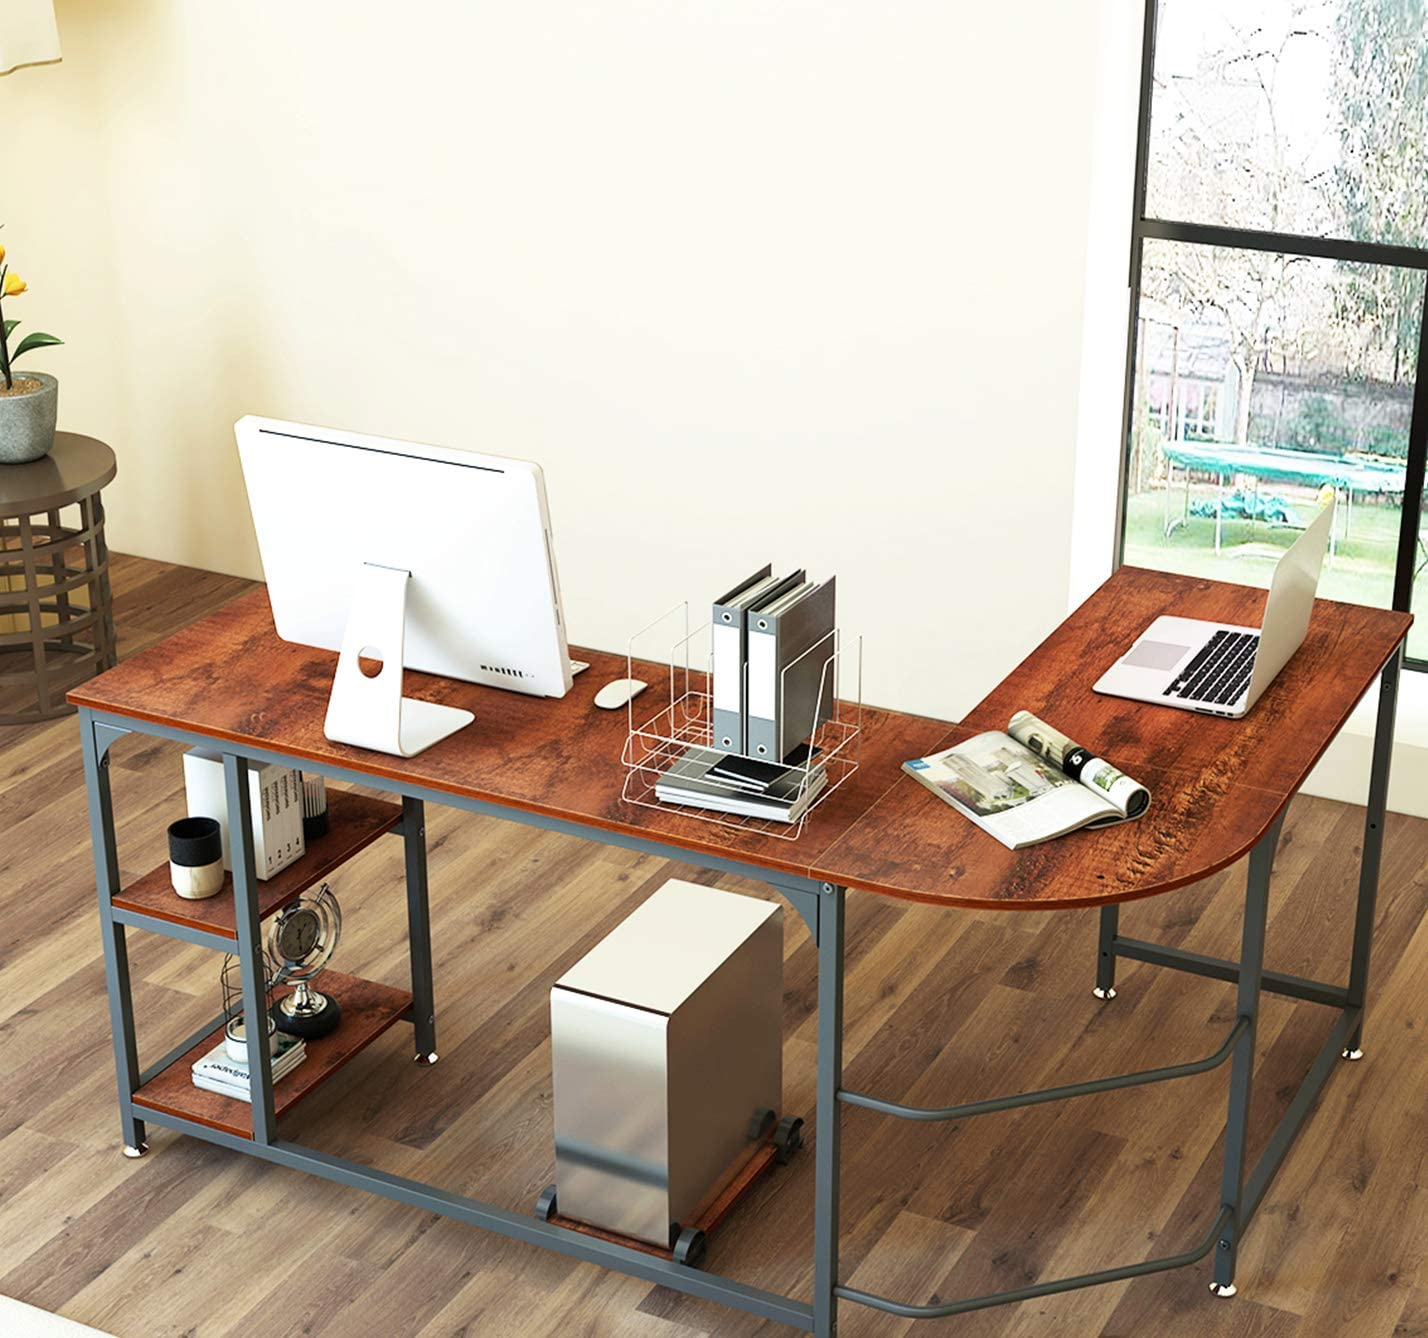 Brilliant Modern L-Shaped Corner Computer Desk Office Table with Open Shelf